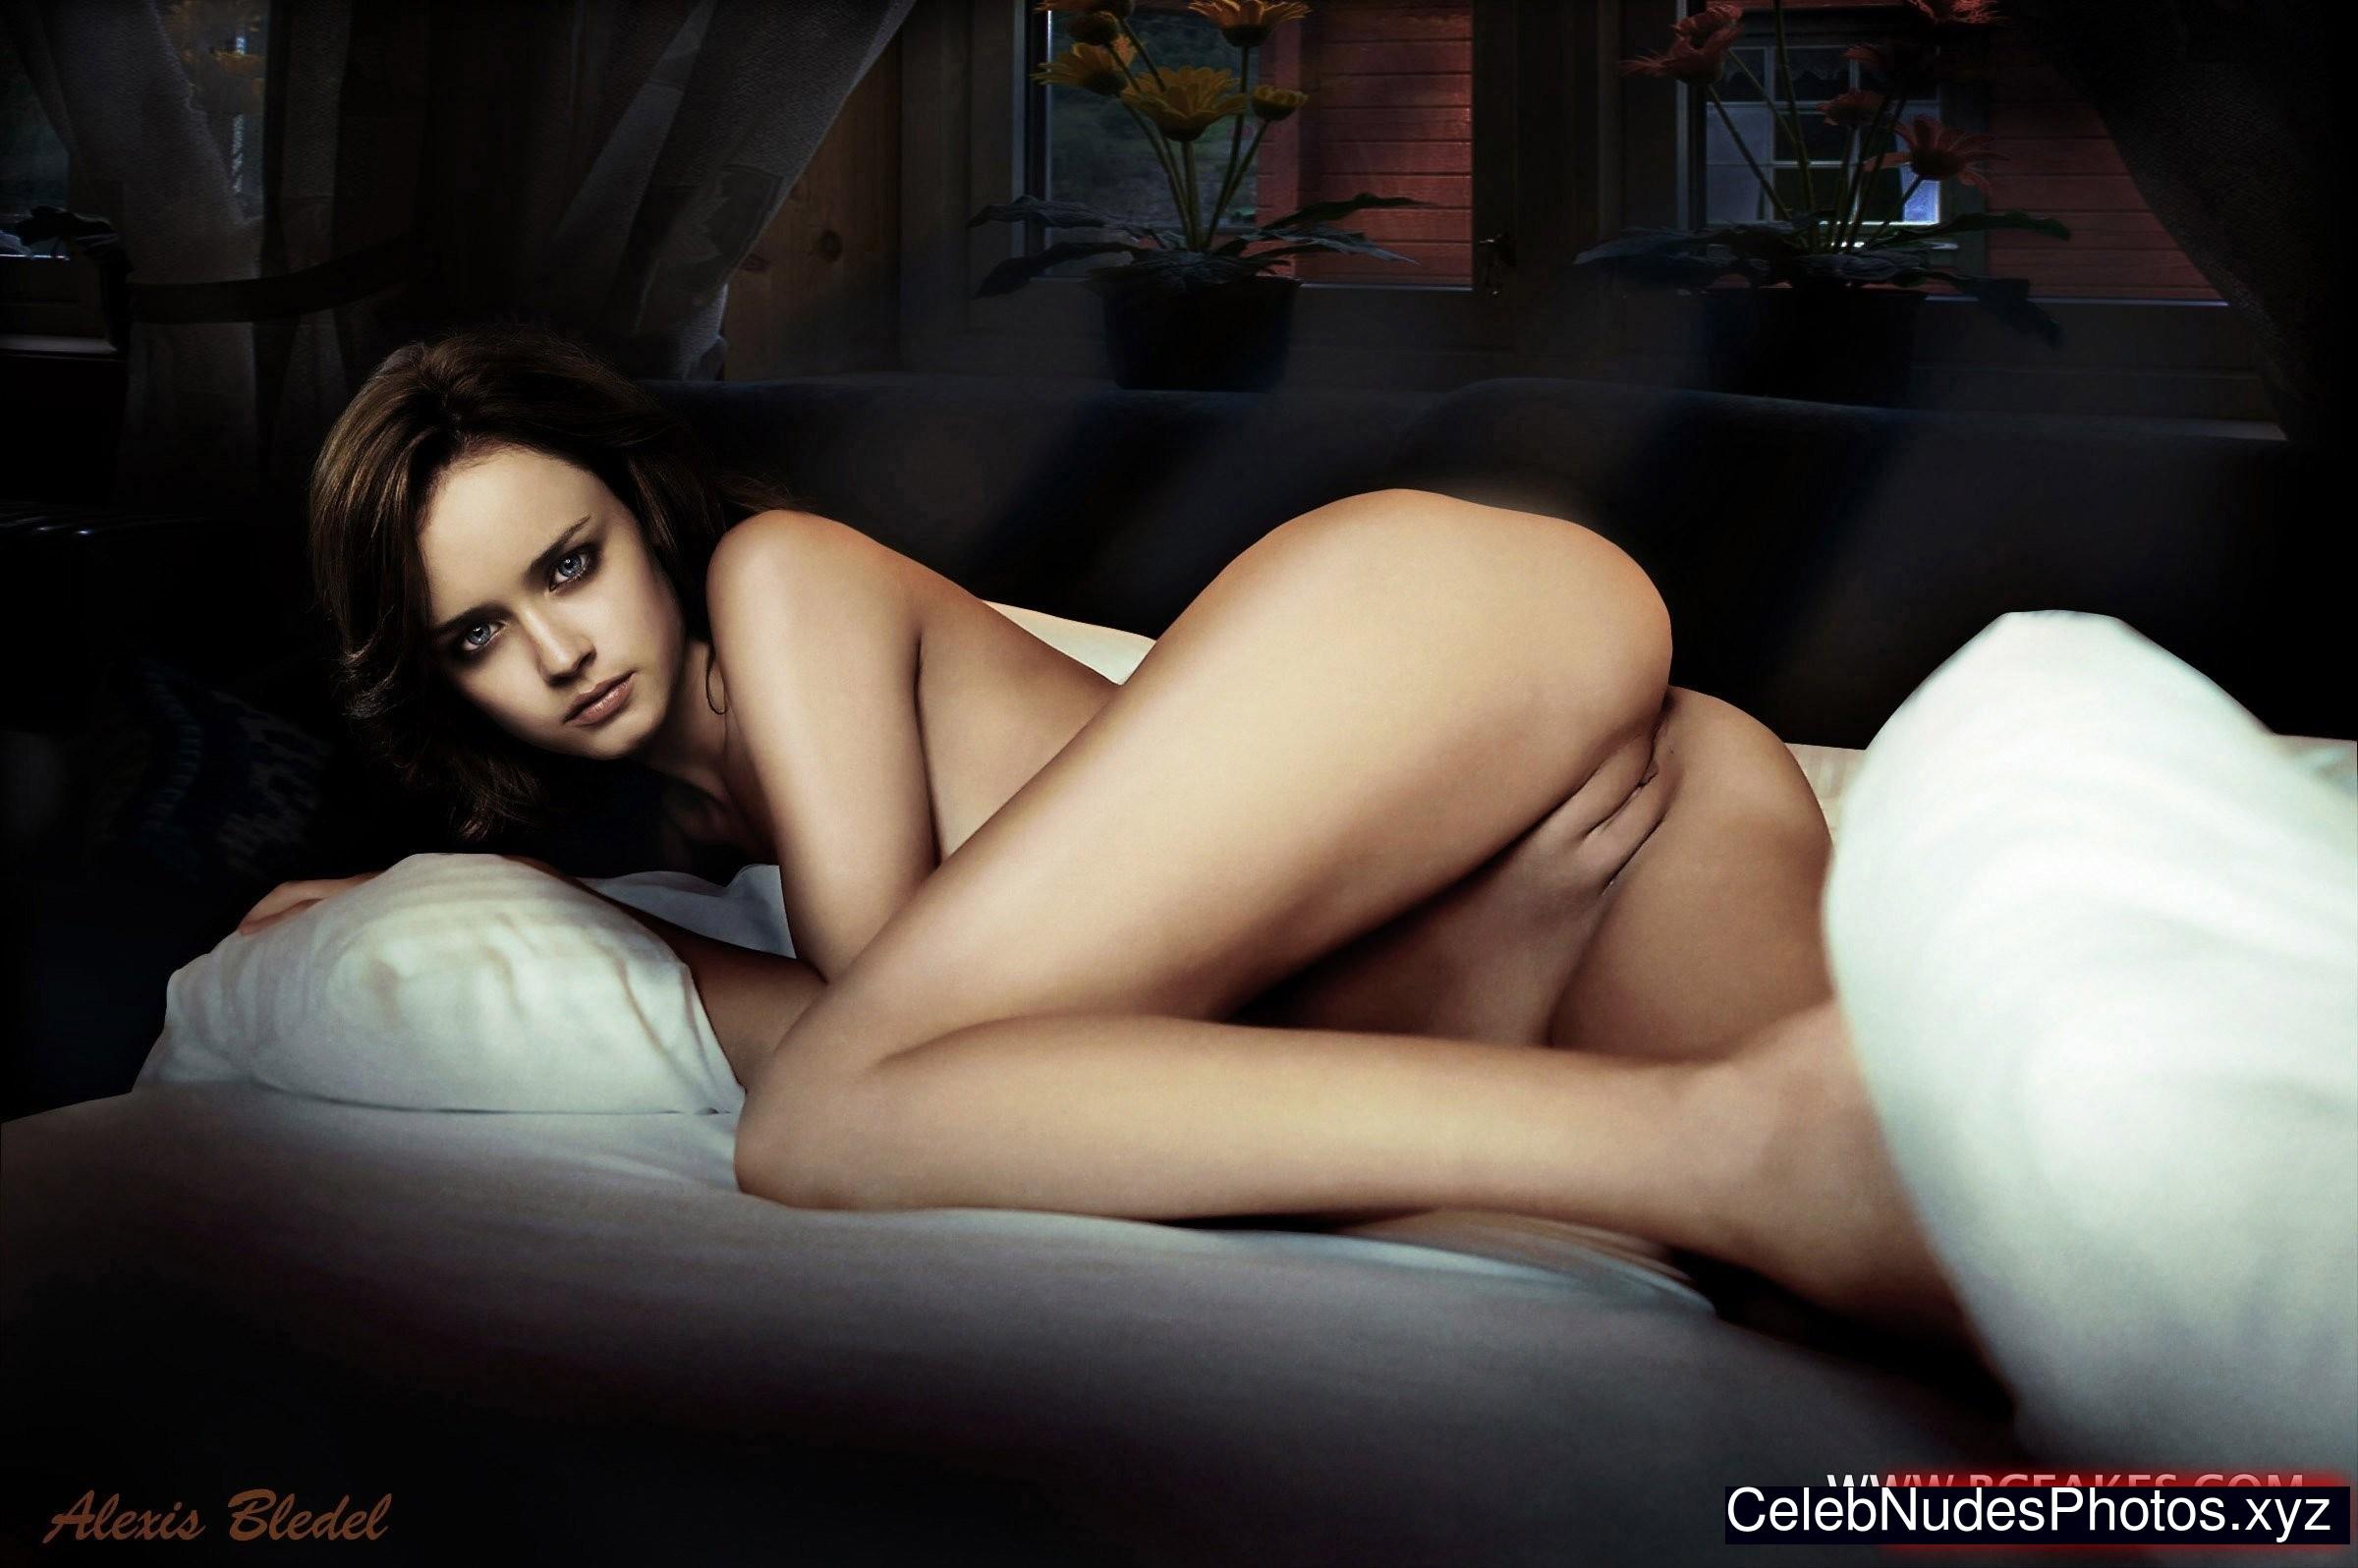 Bledel of alex nude pictures